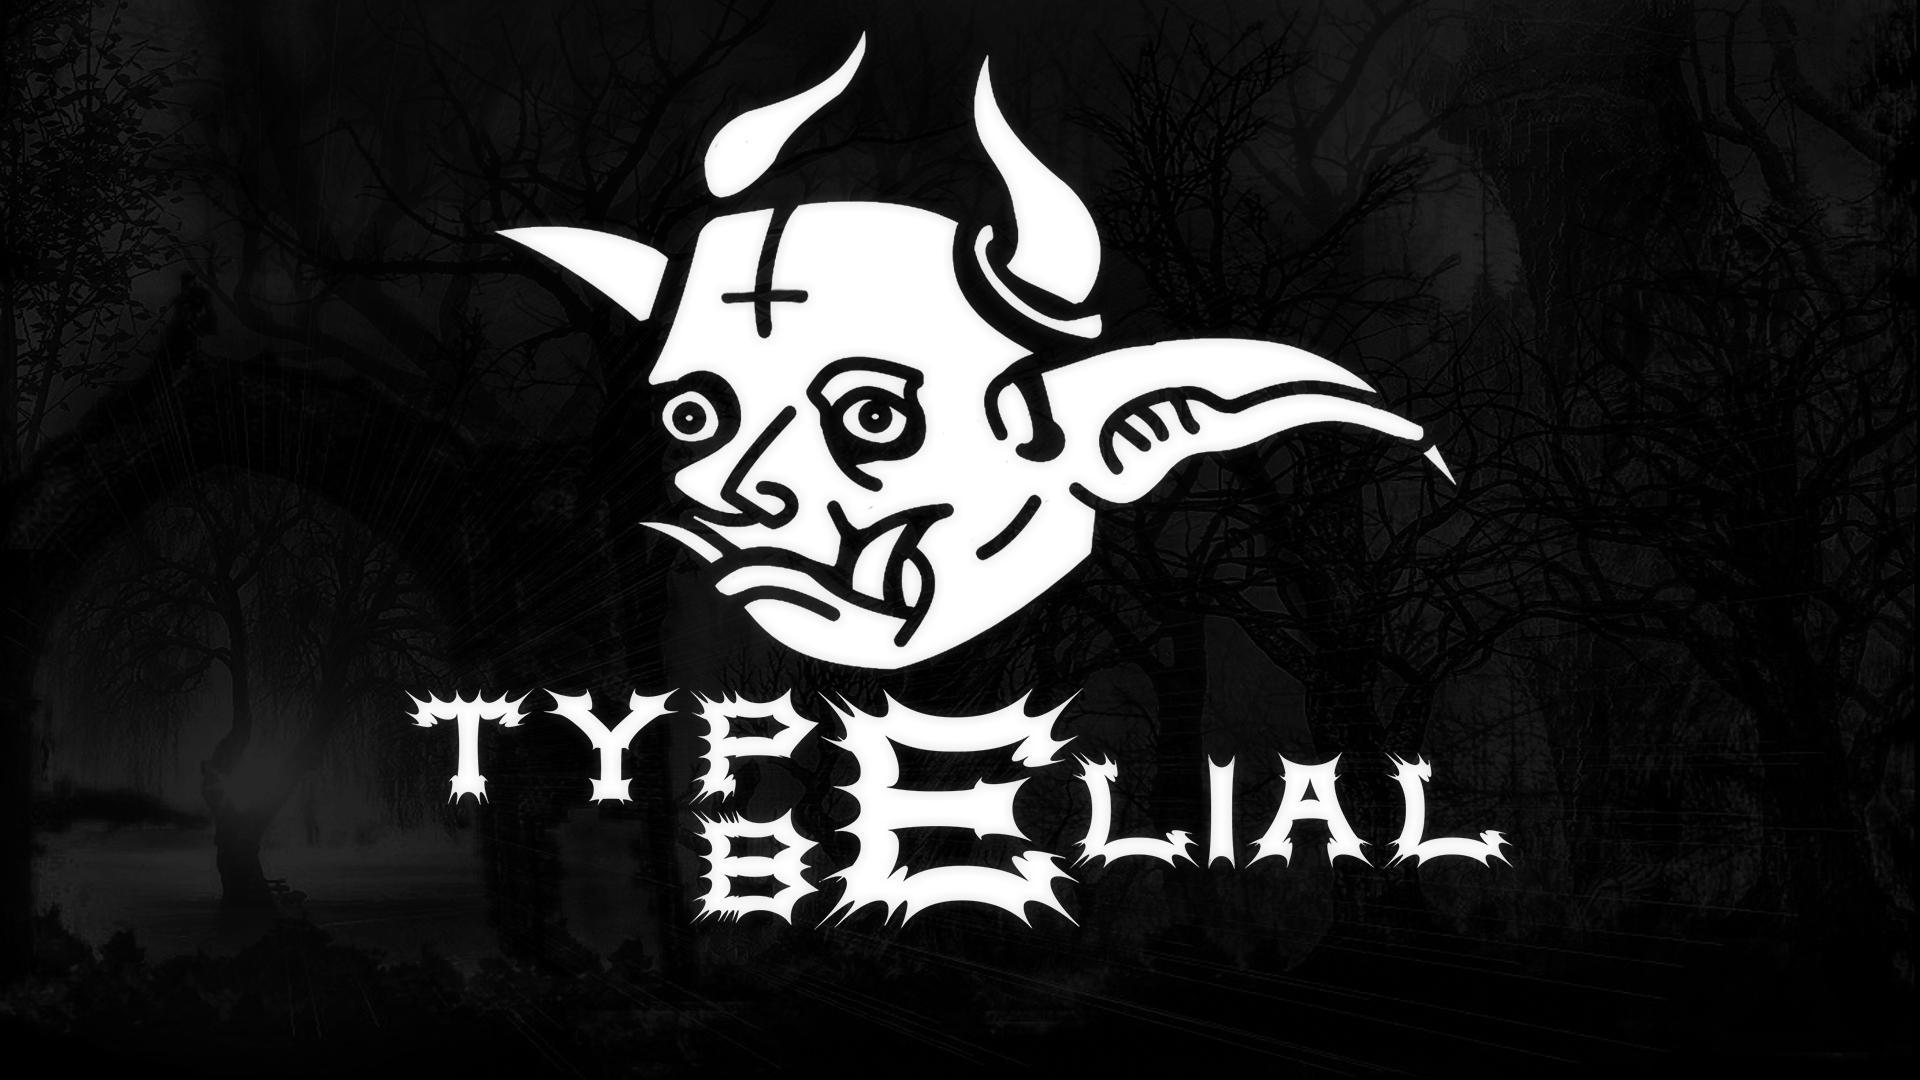 Wallpaper Band TYPE BELIAL by TheDamDamBW12